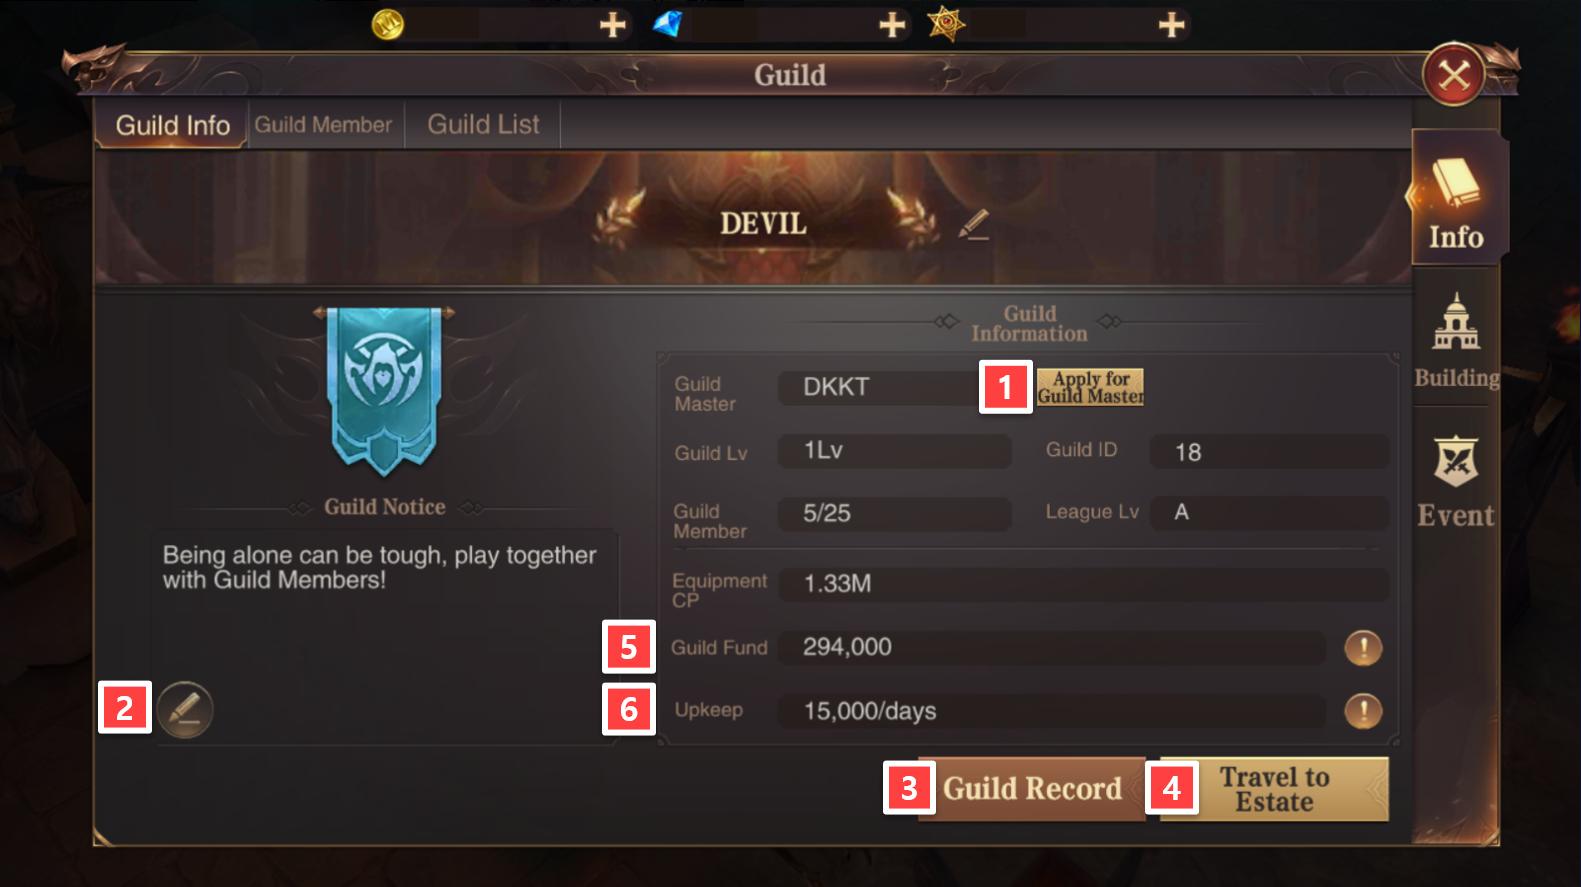 Guild Info